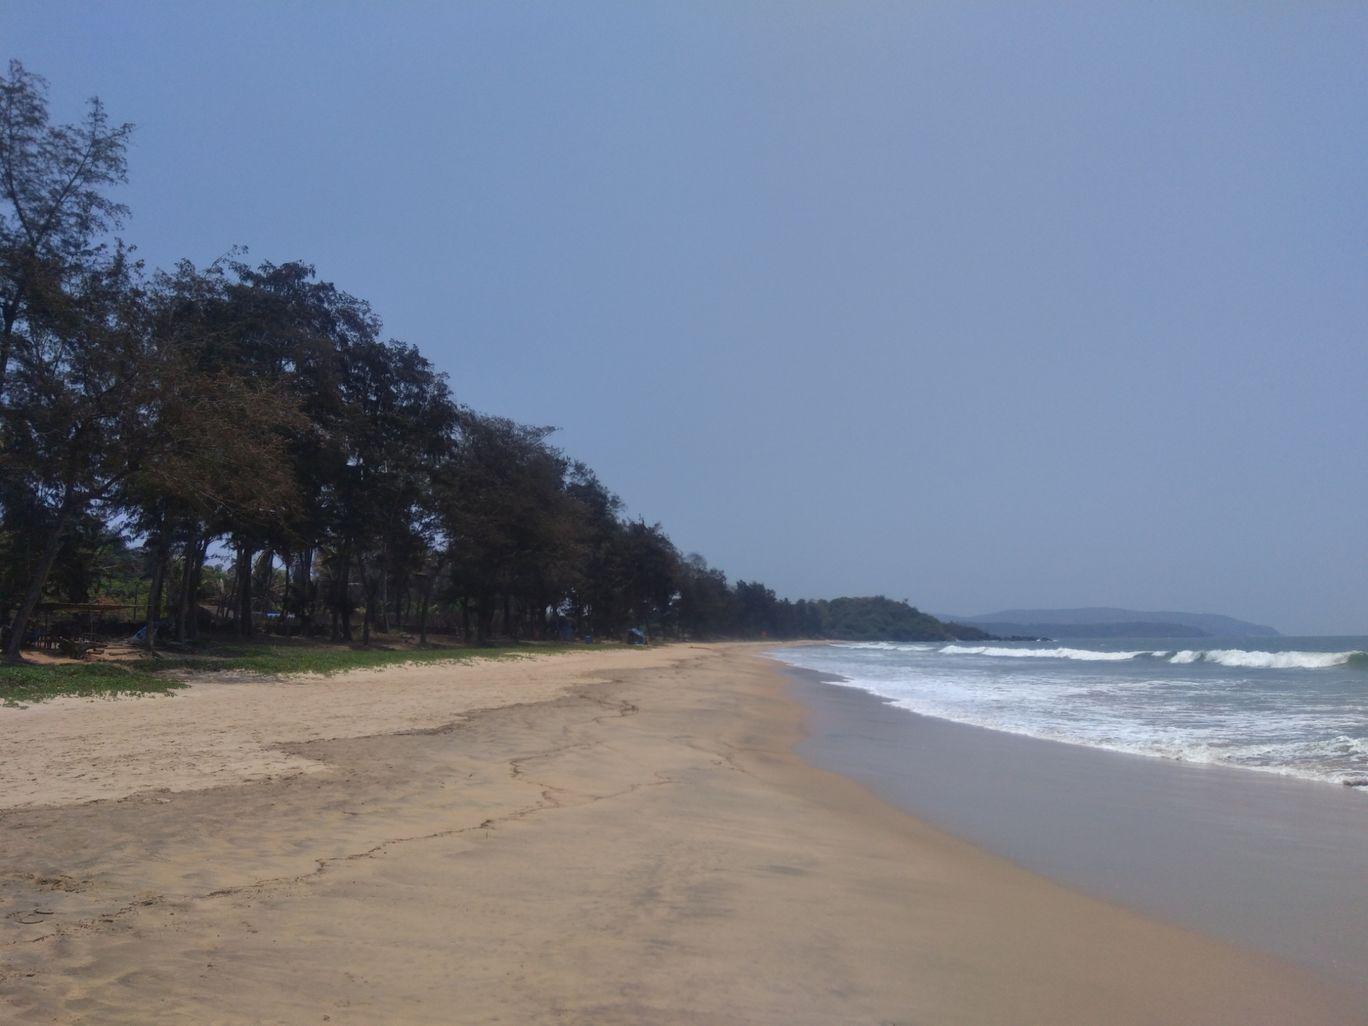 Photo of Talpona Beach By Ishang Sinha